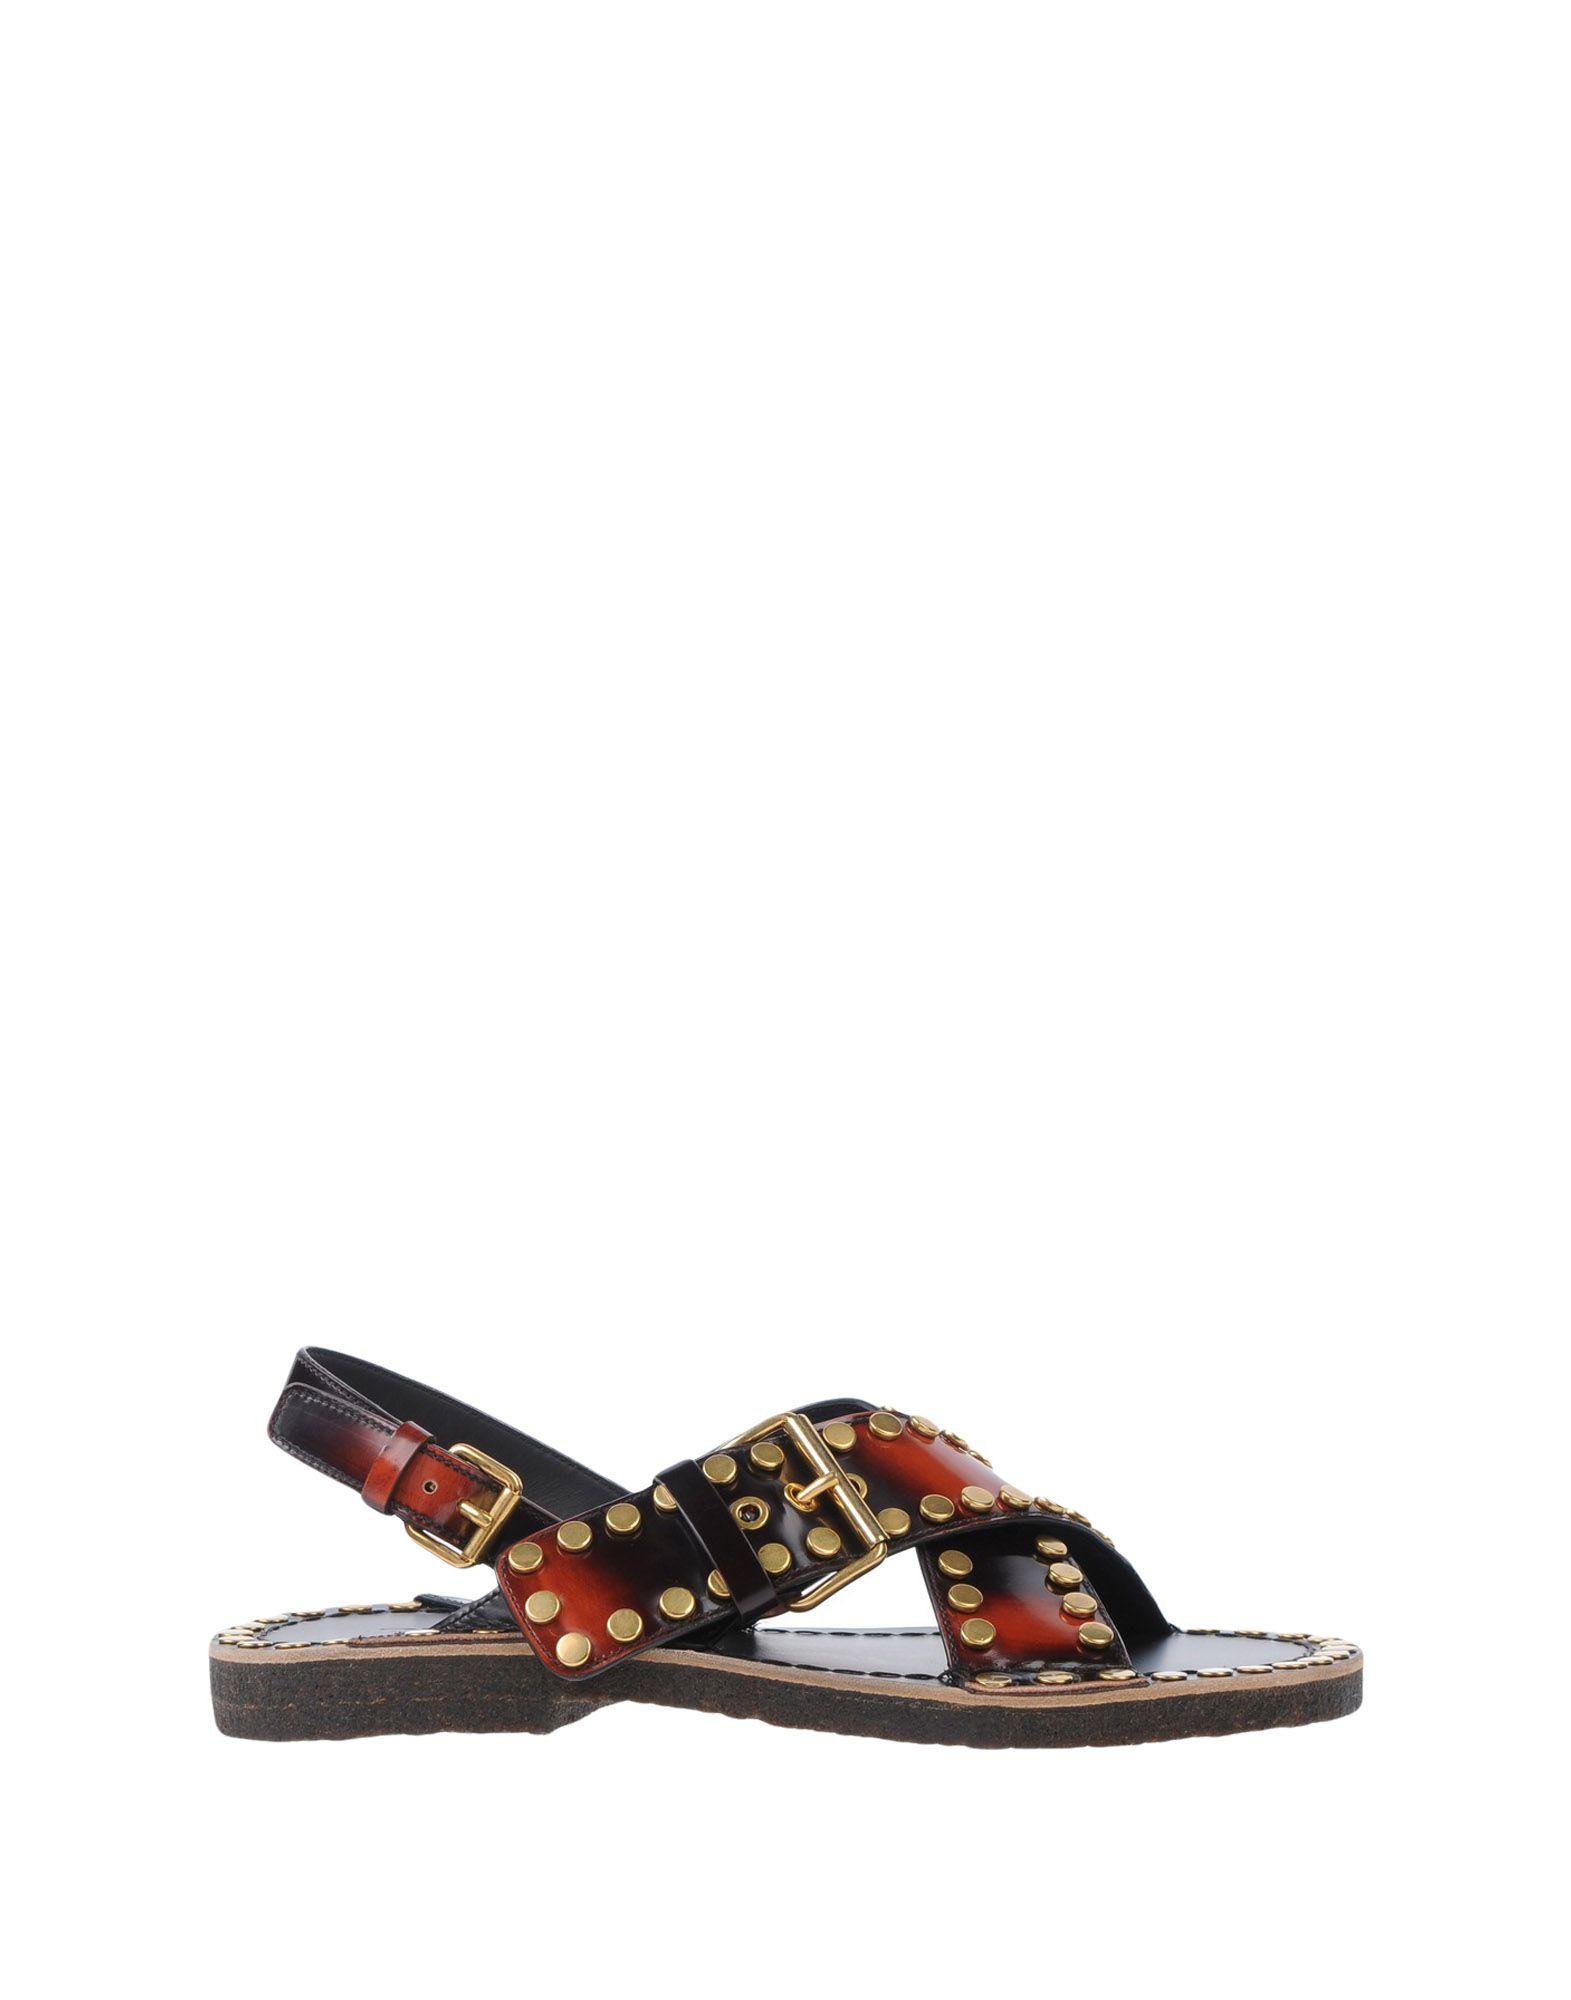 Prada Sandalen Sandalen Sandalen Herren  11511196CF Heiße Schuhe 7300a7